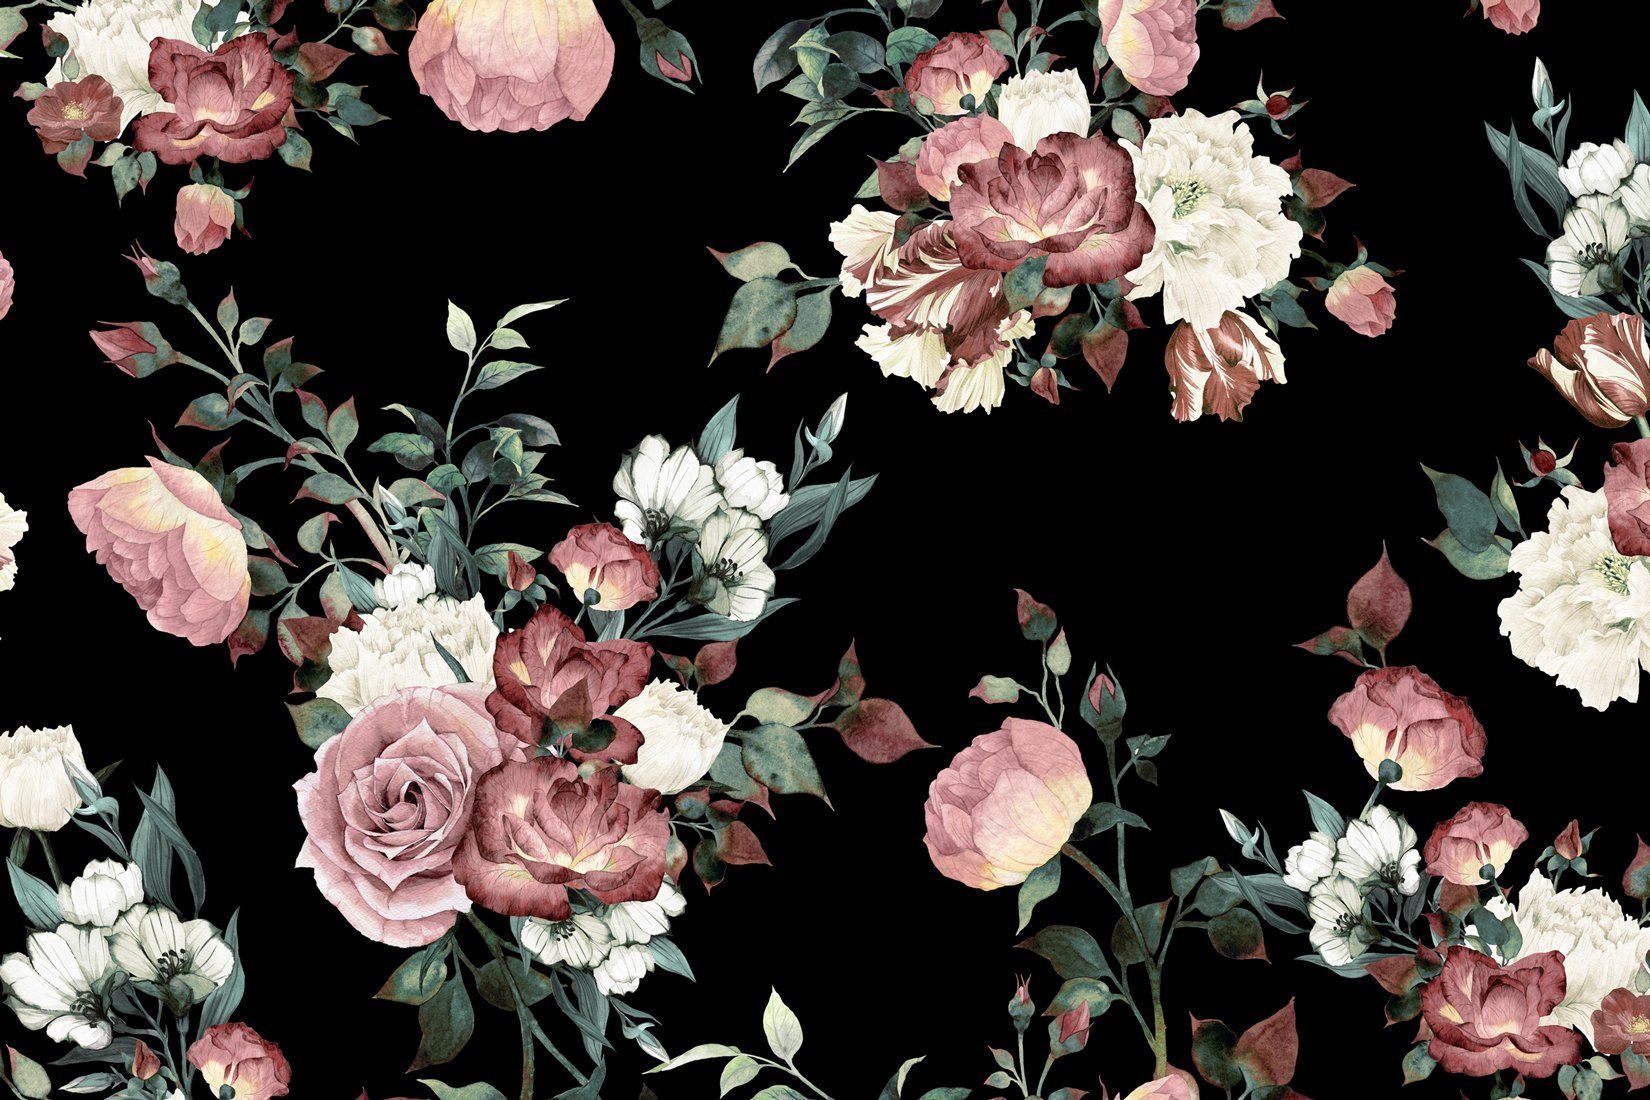 Vintage Pink And Cream Dark Floral Wall Mural Black Floral